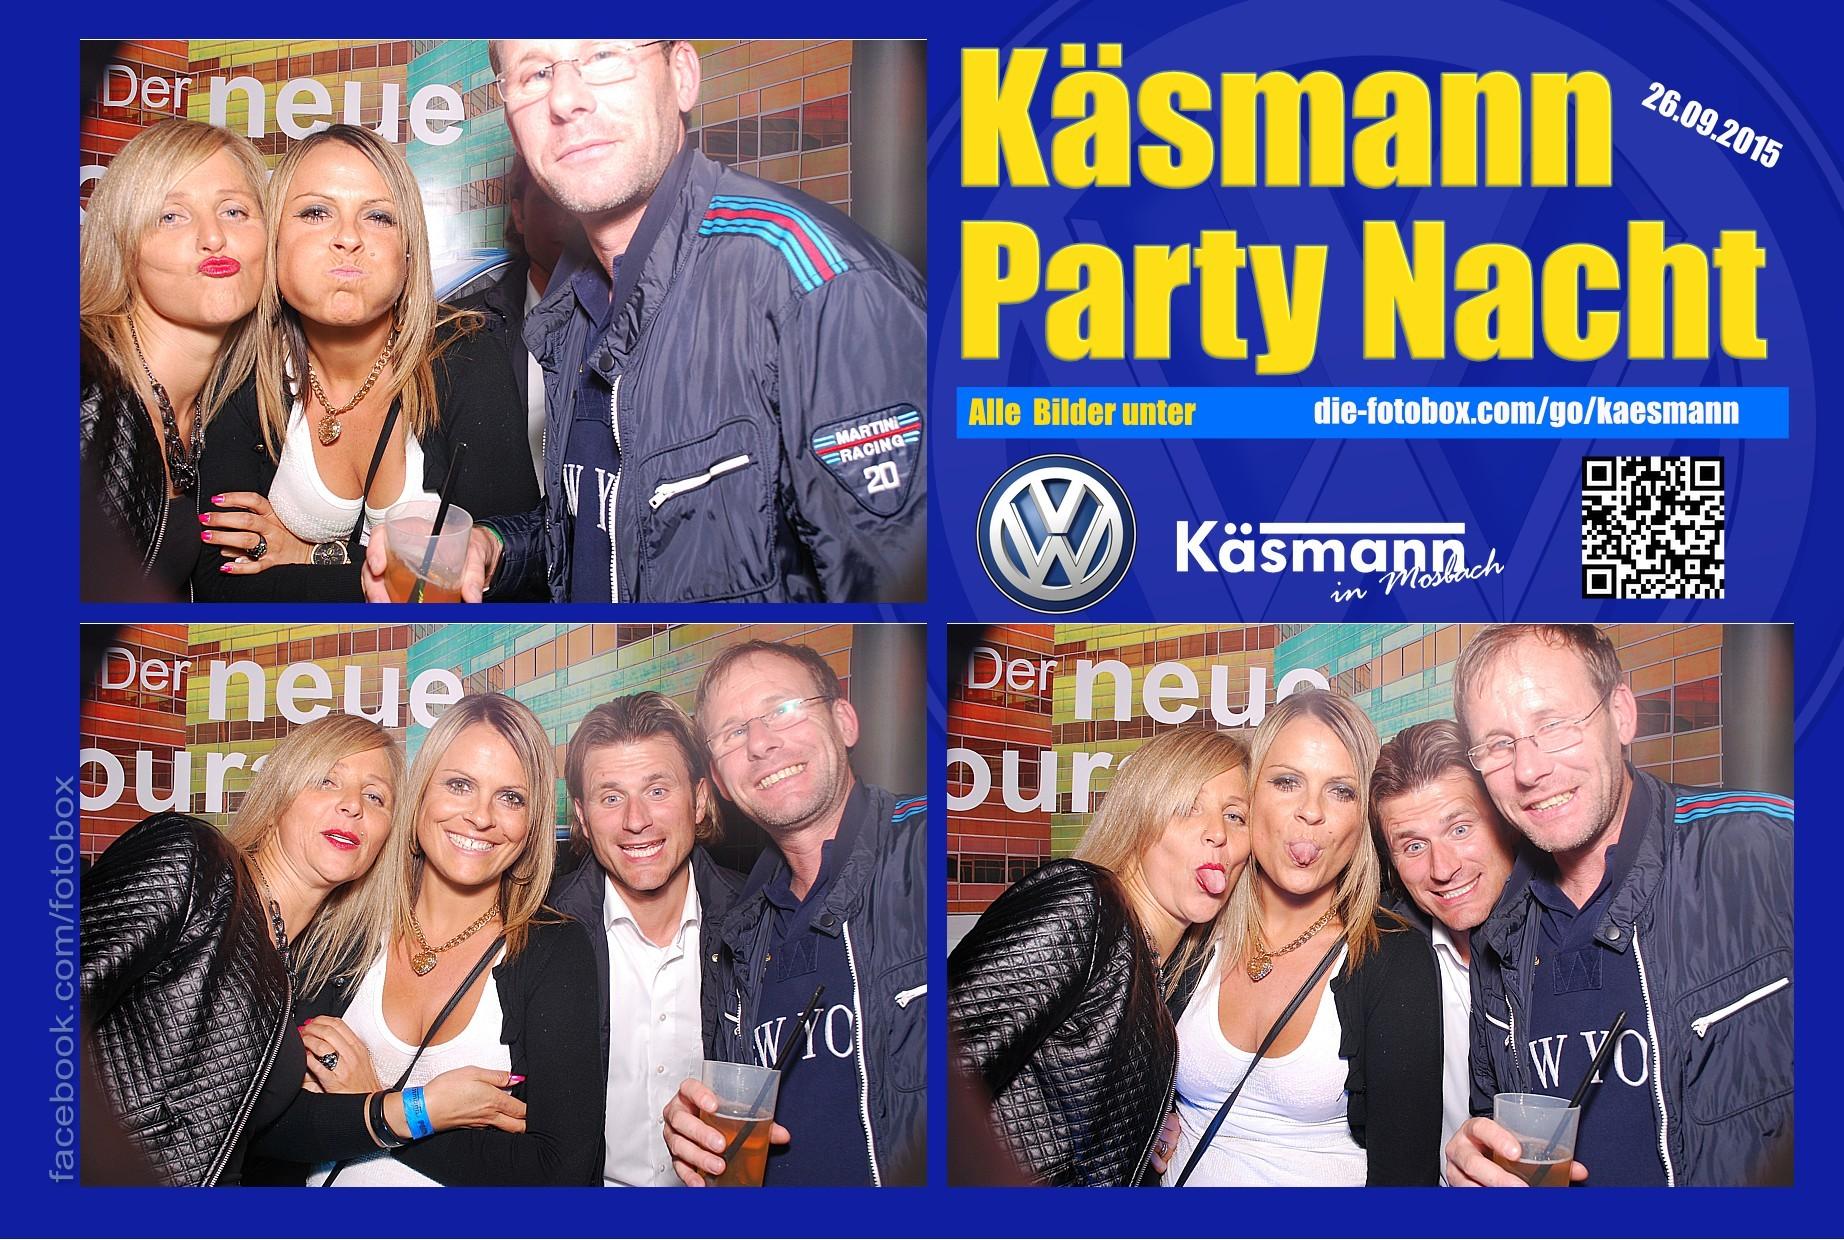 Käsmannparty 2015 - www.die-fotobox.com 01268